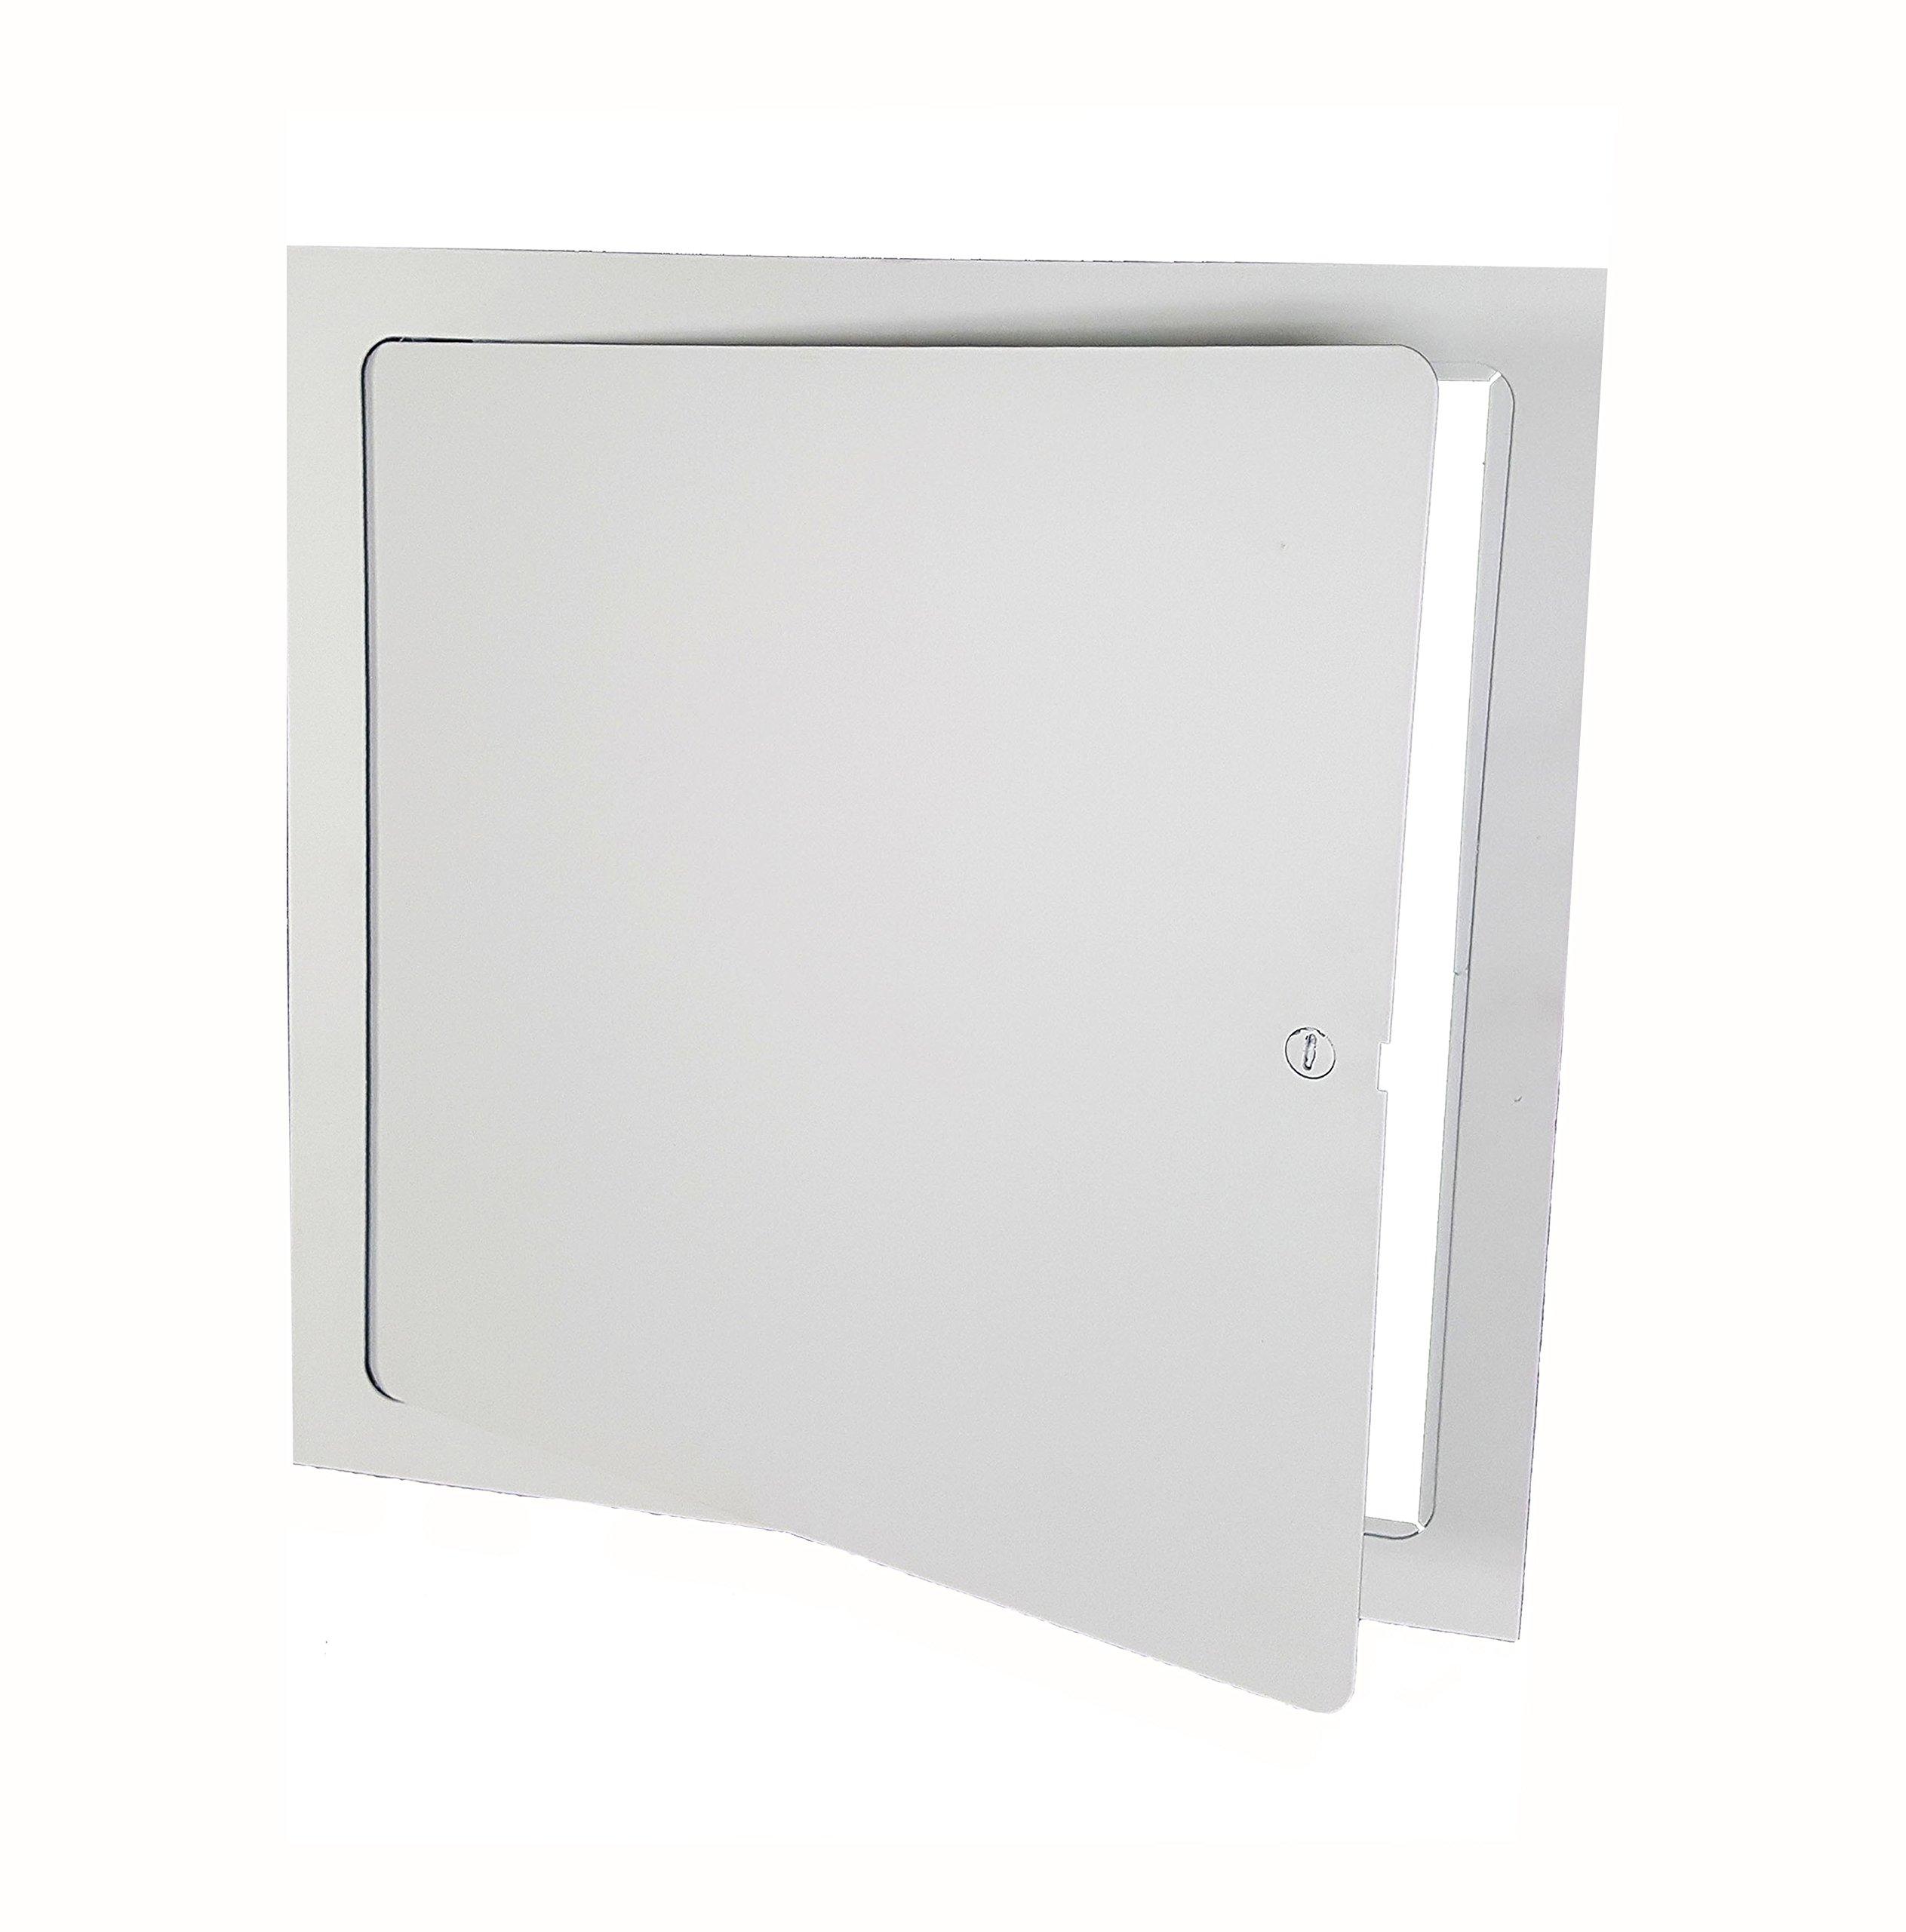 Premier FL-8 x 8 Flush Access Door, Steel, Powder Coated White by Premier Access Doors